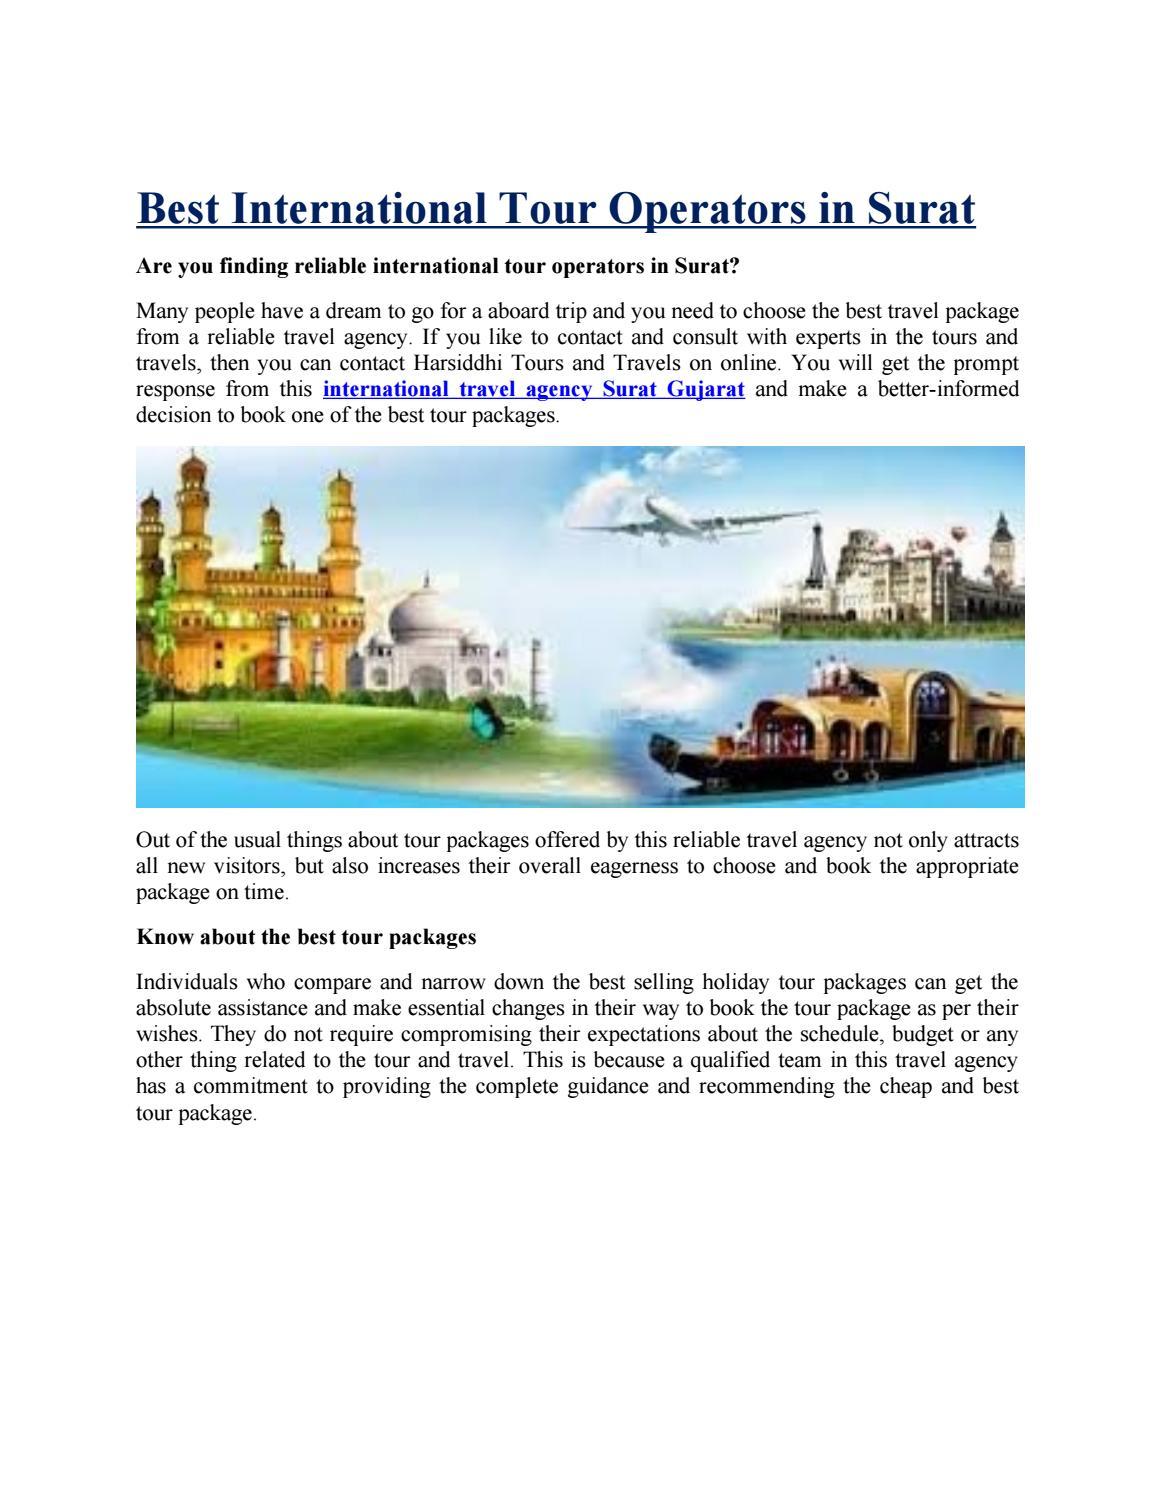 Best International Tour Operators in Surat